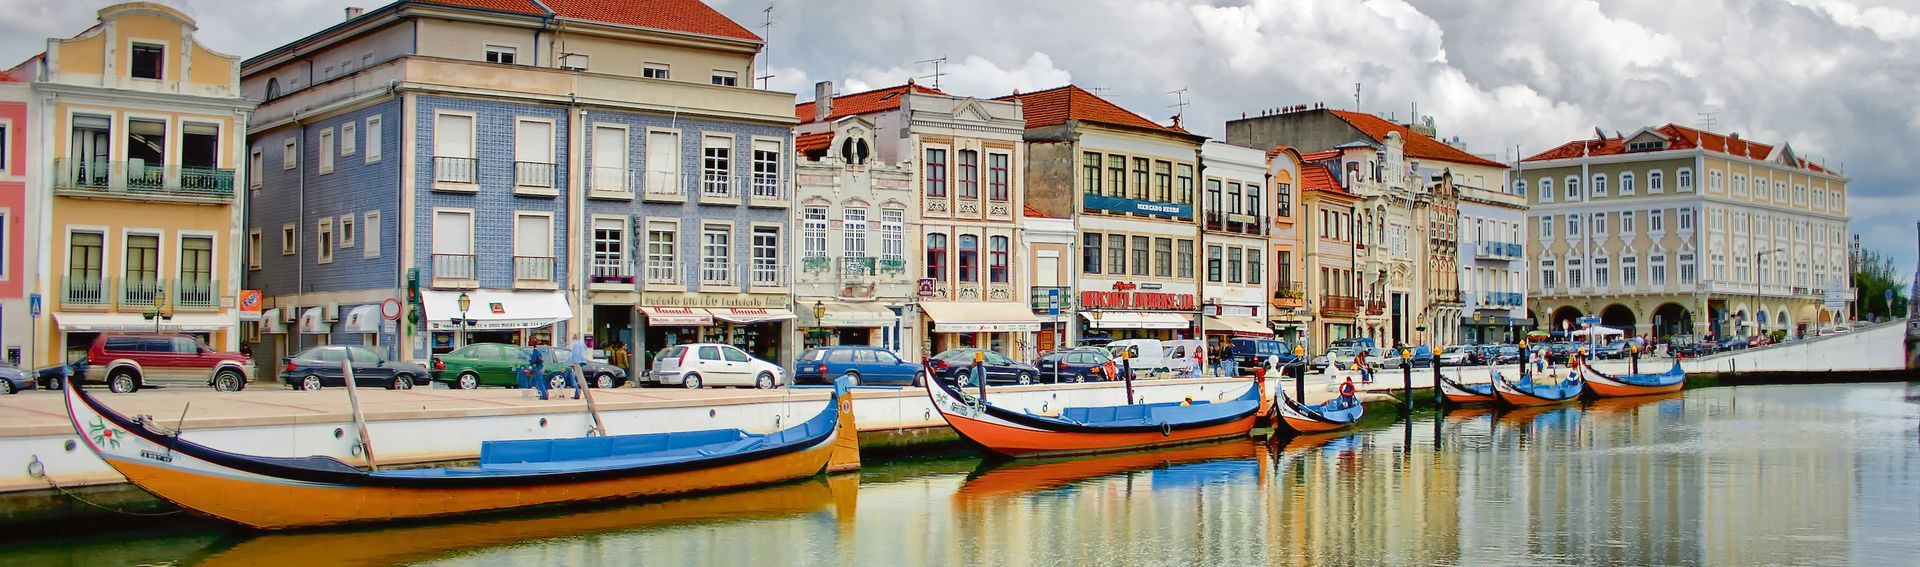 Portugal central